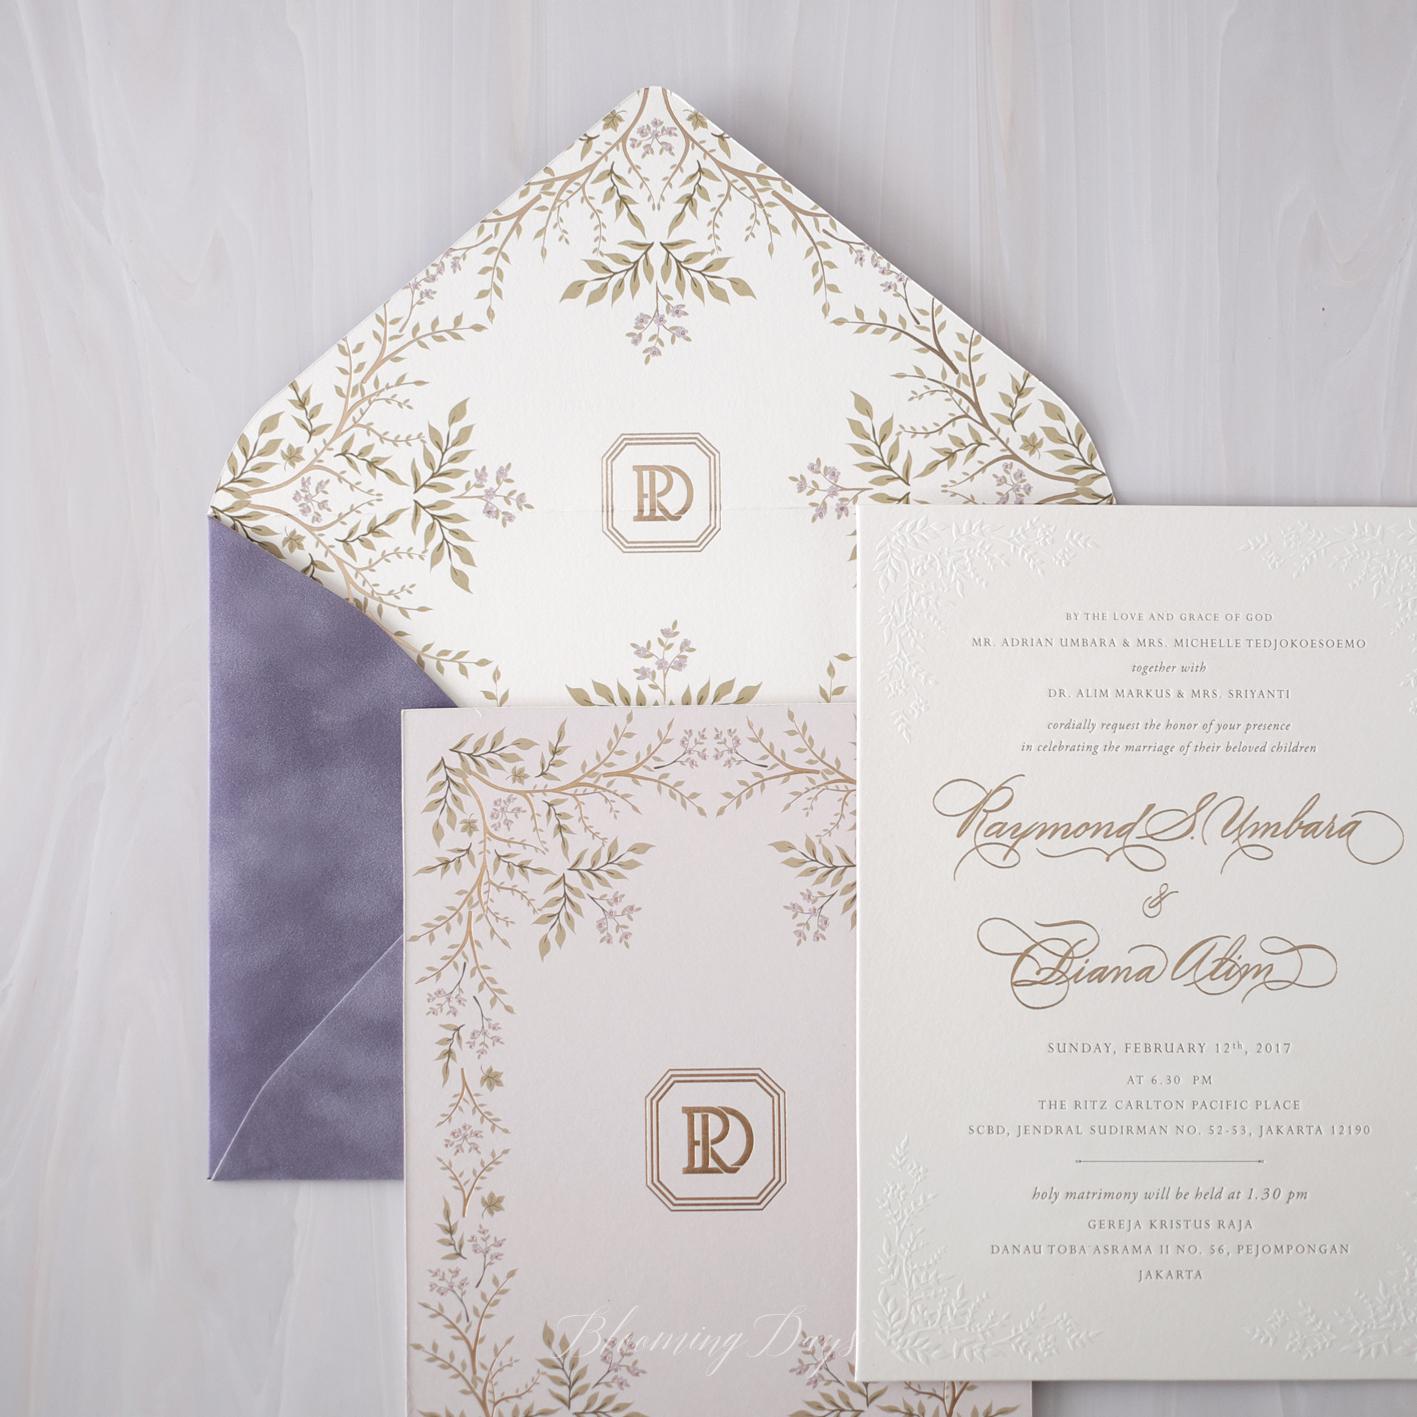 Bloomingdays invitation studio wedding invitations in surabaya bloomingdays invitation studio wedding invitations in surabaya bridestory stopboris Gallery